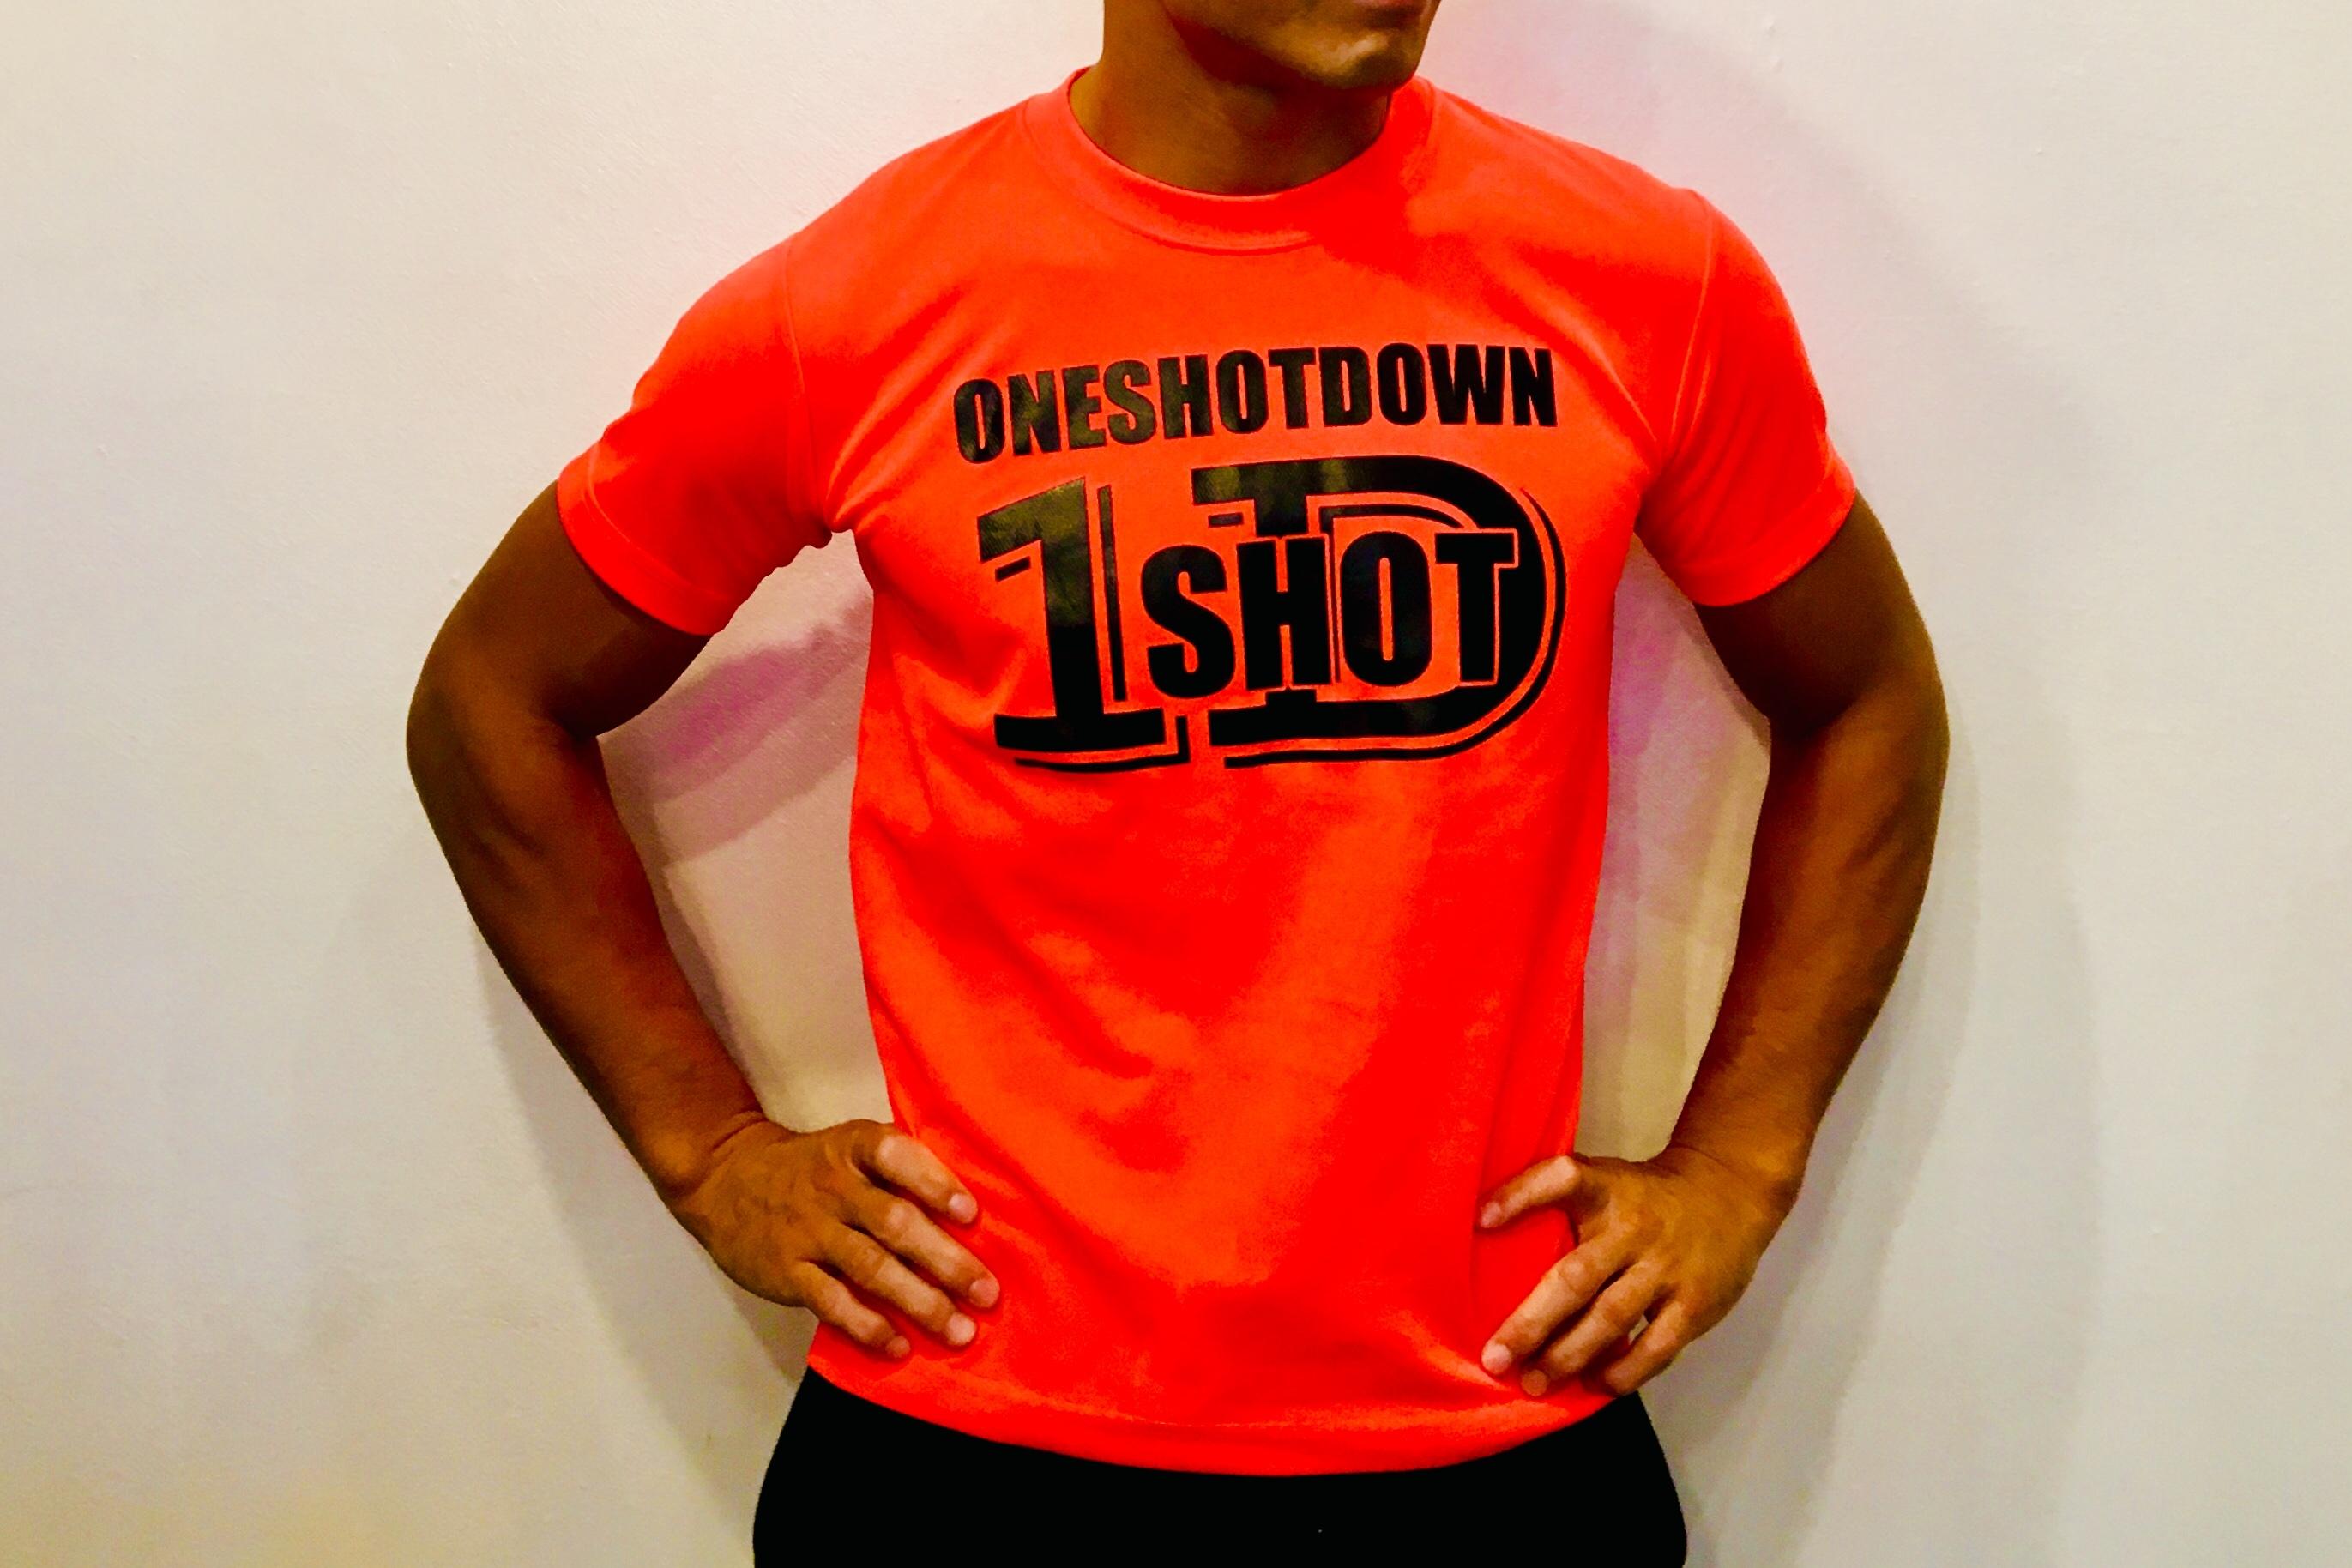 ONESHOTDOWN ネオンカラードライTシャツ - 画像2